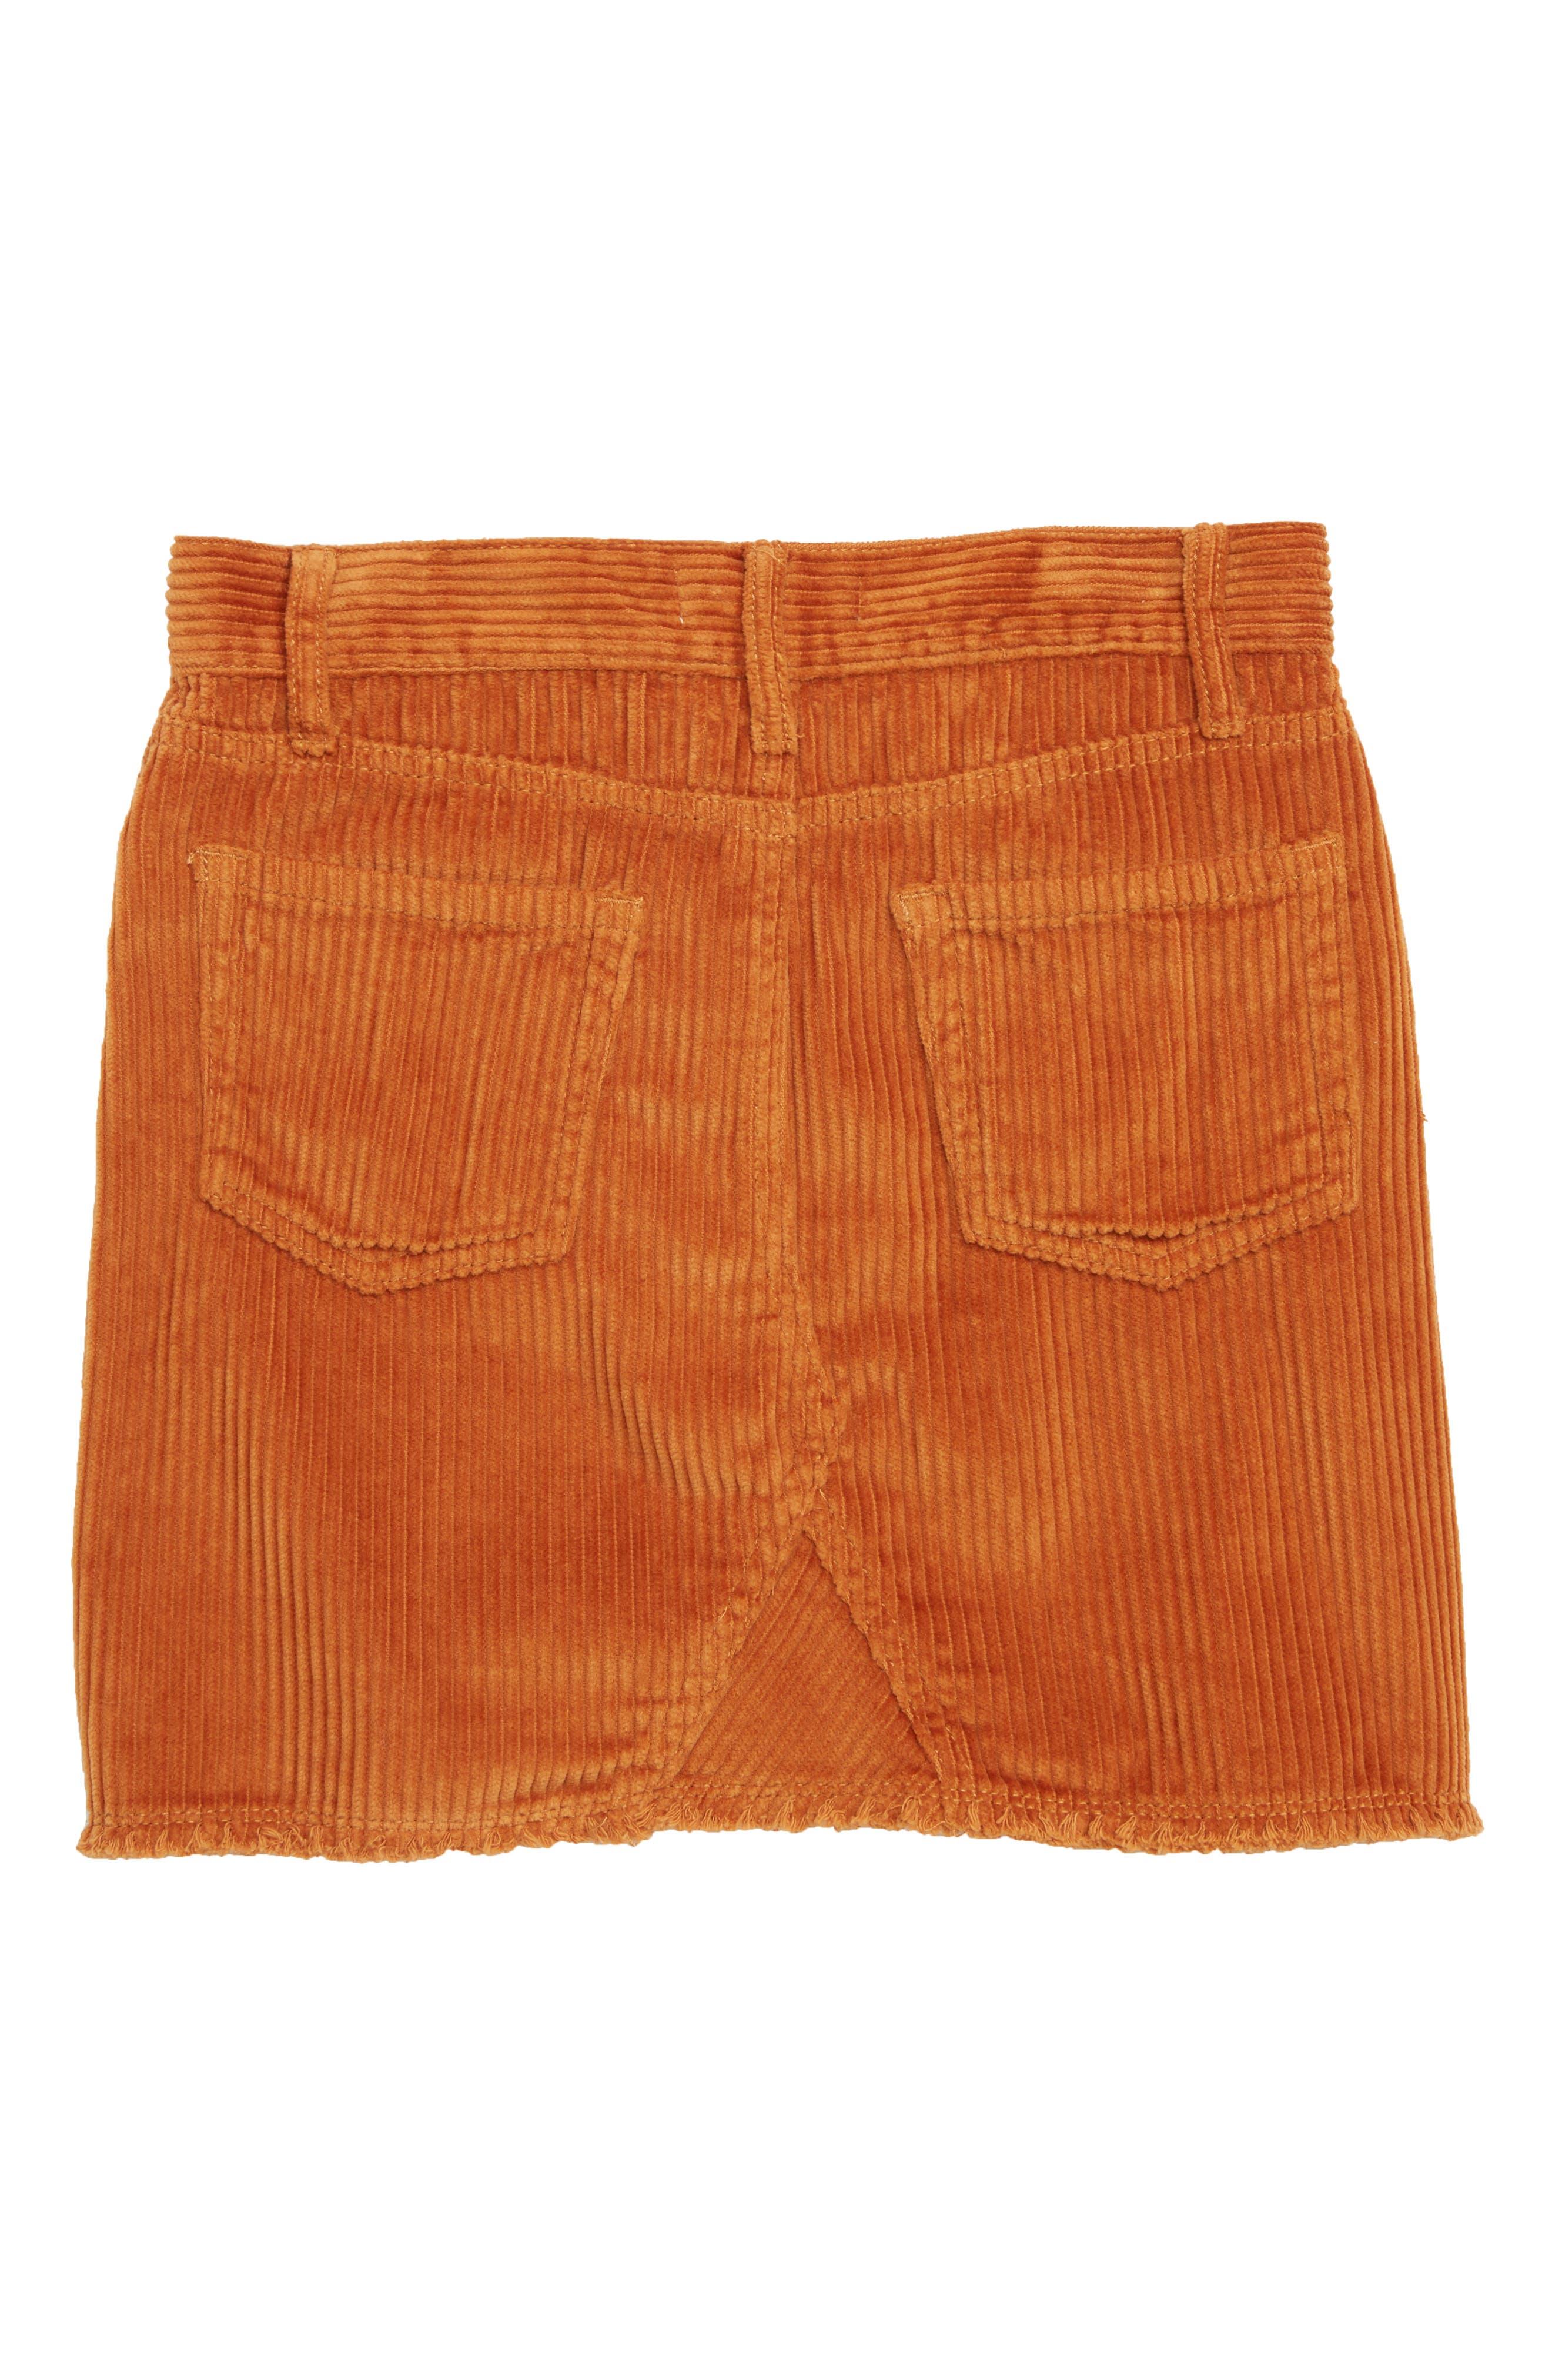 Corduroy Skirt,                             Alternate thumbnail 2, color,                             TAN ADOBE